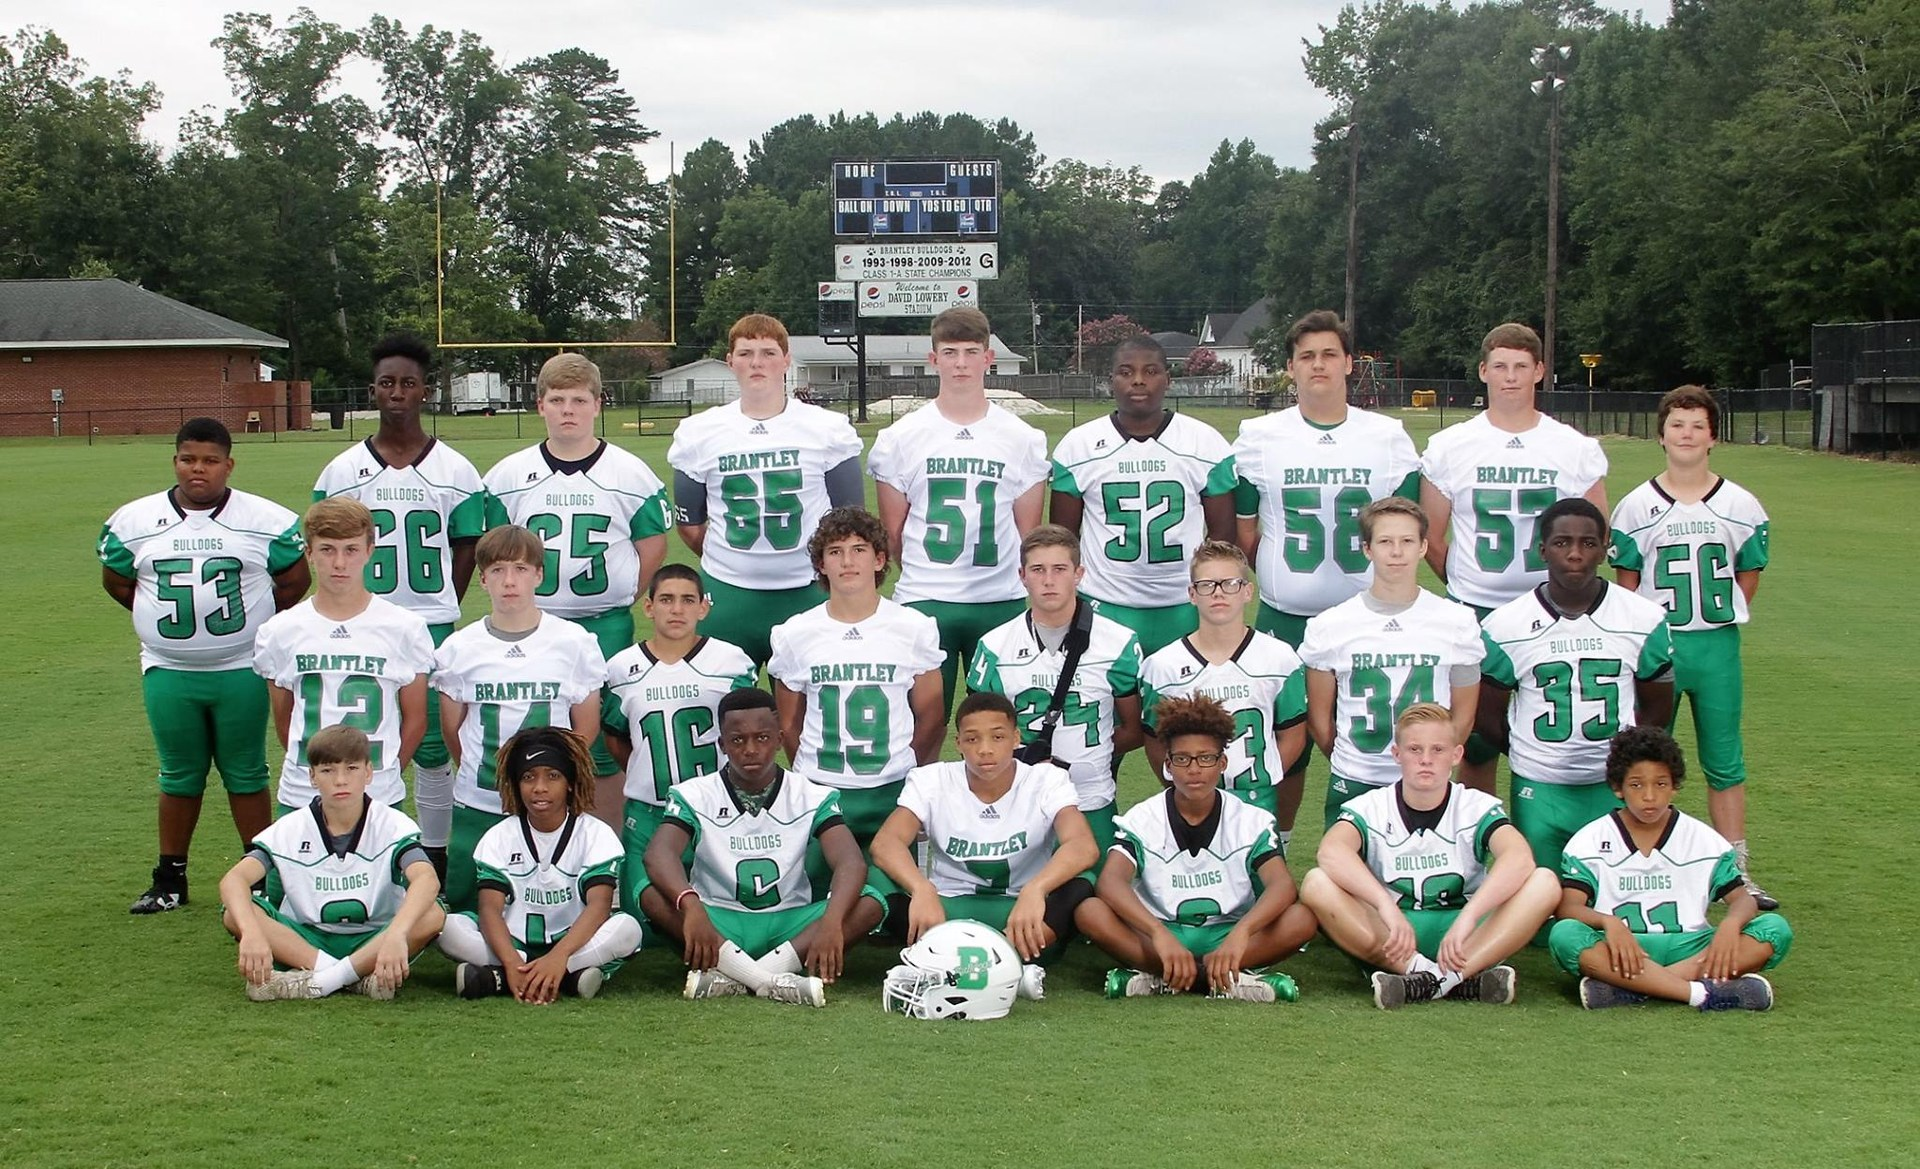 jv football team